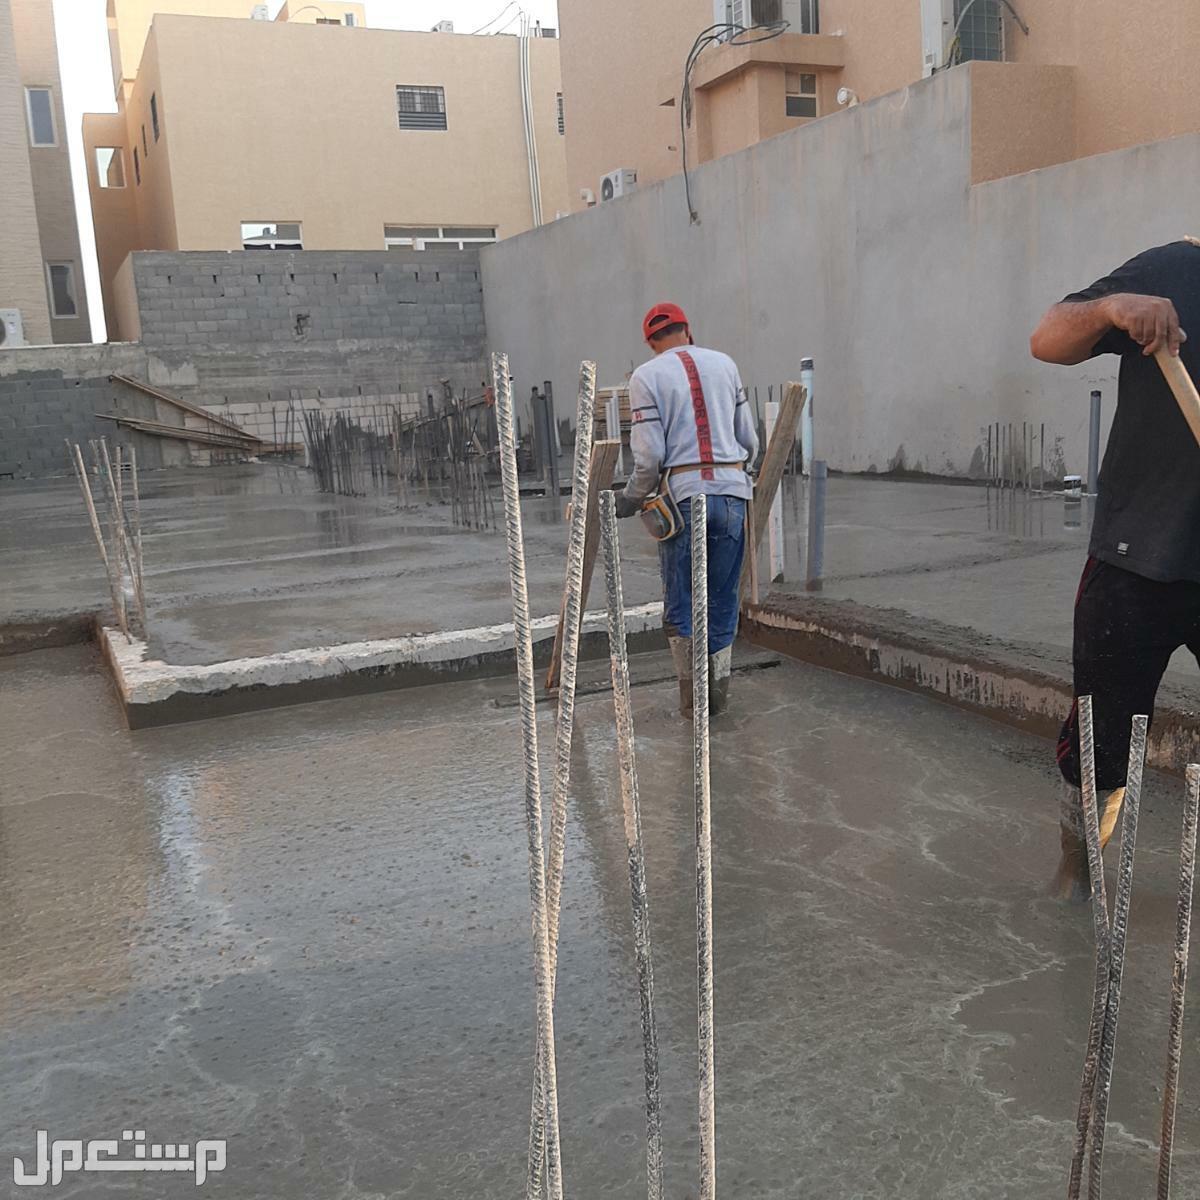 مقاول ملاحق تكمله مساجد مدارس  قصور تسوير اراضي زراعيه وسكنيه